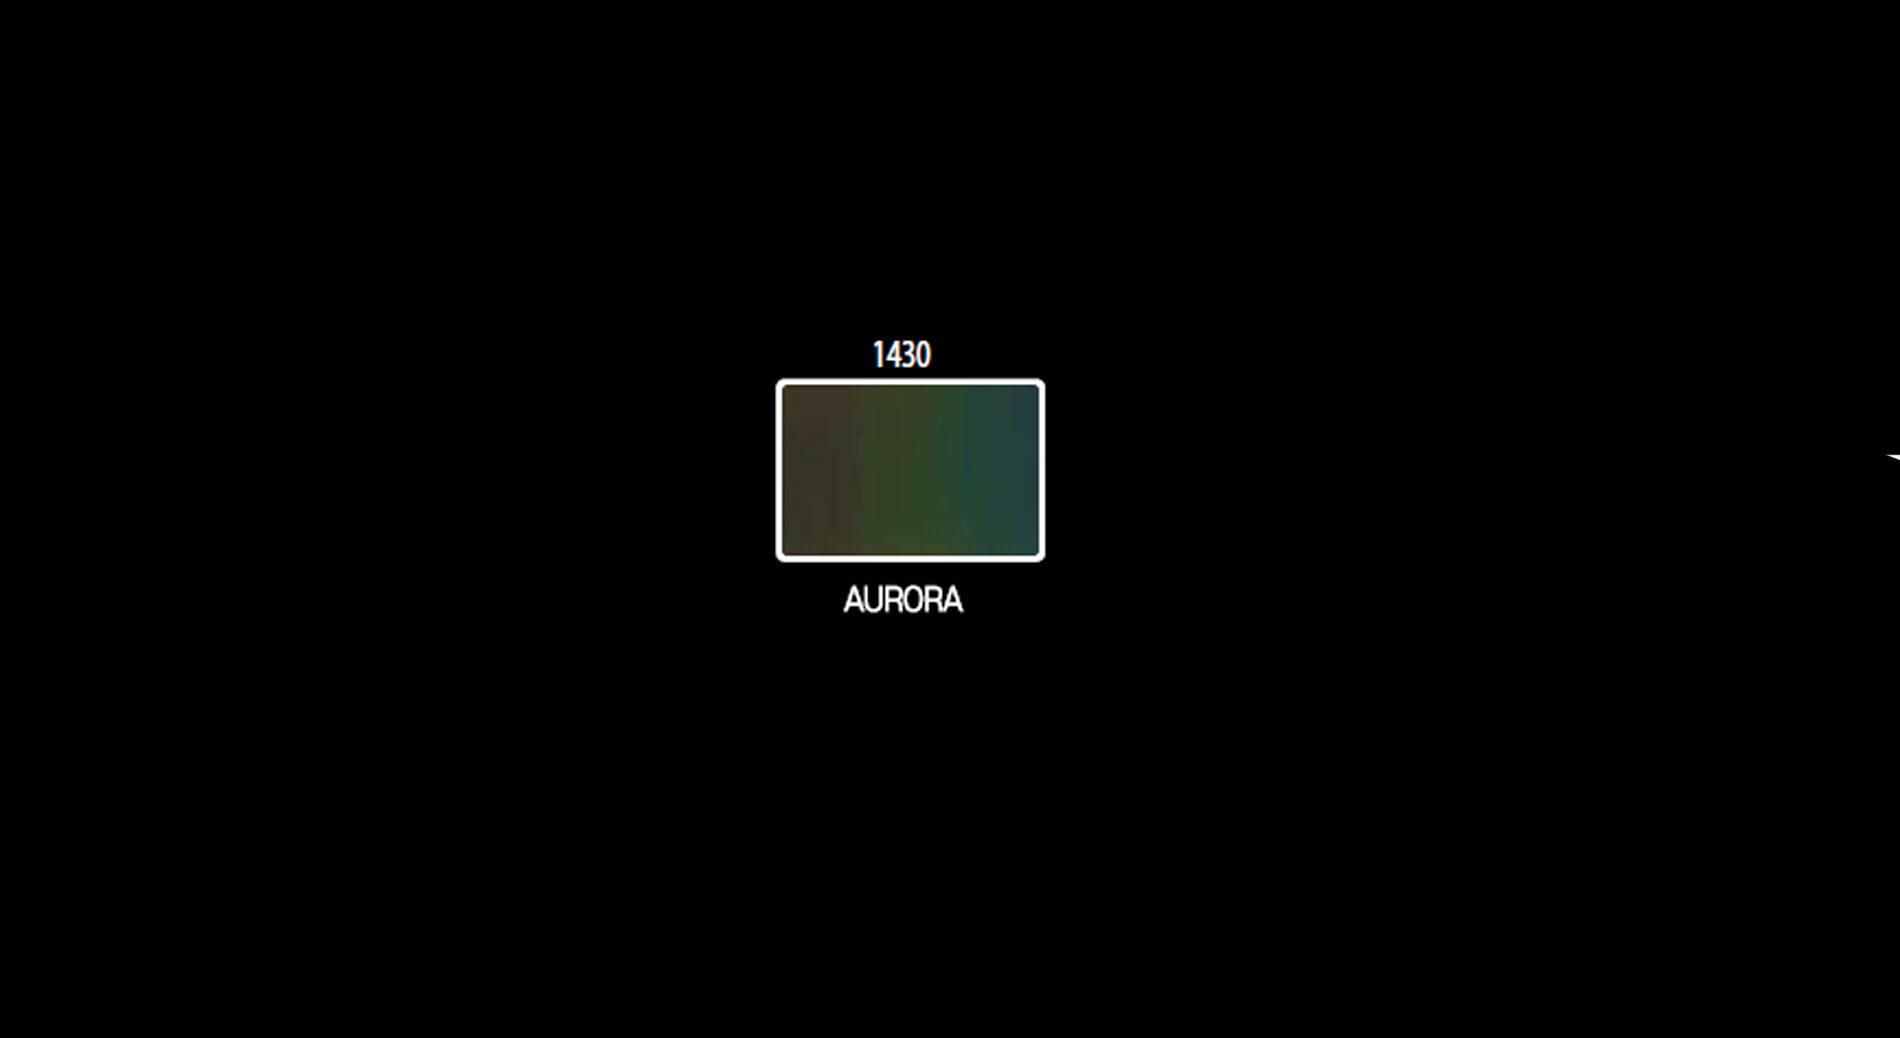 Aurora color